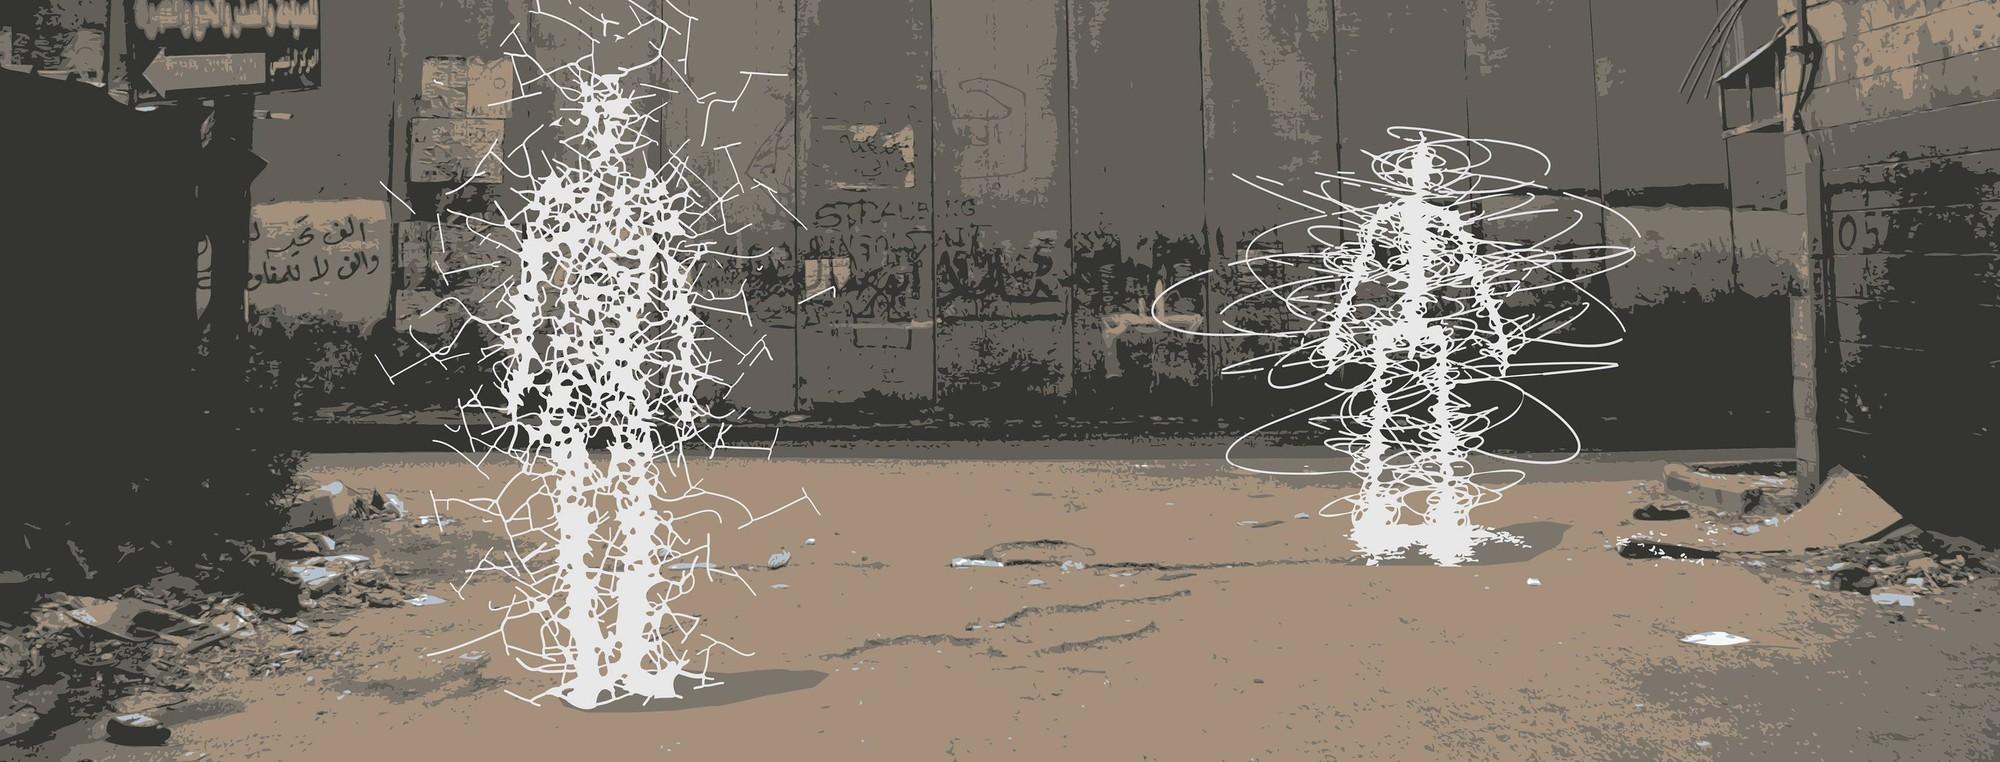 "Palestra ""No Escape from the Body: A política corporal do pano, a parede e da rua"", com Léopold Lambert, no Studio-X Rio, Courtesy of Studio-X Rio"